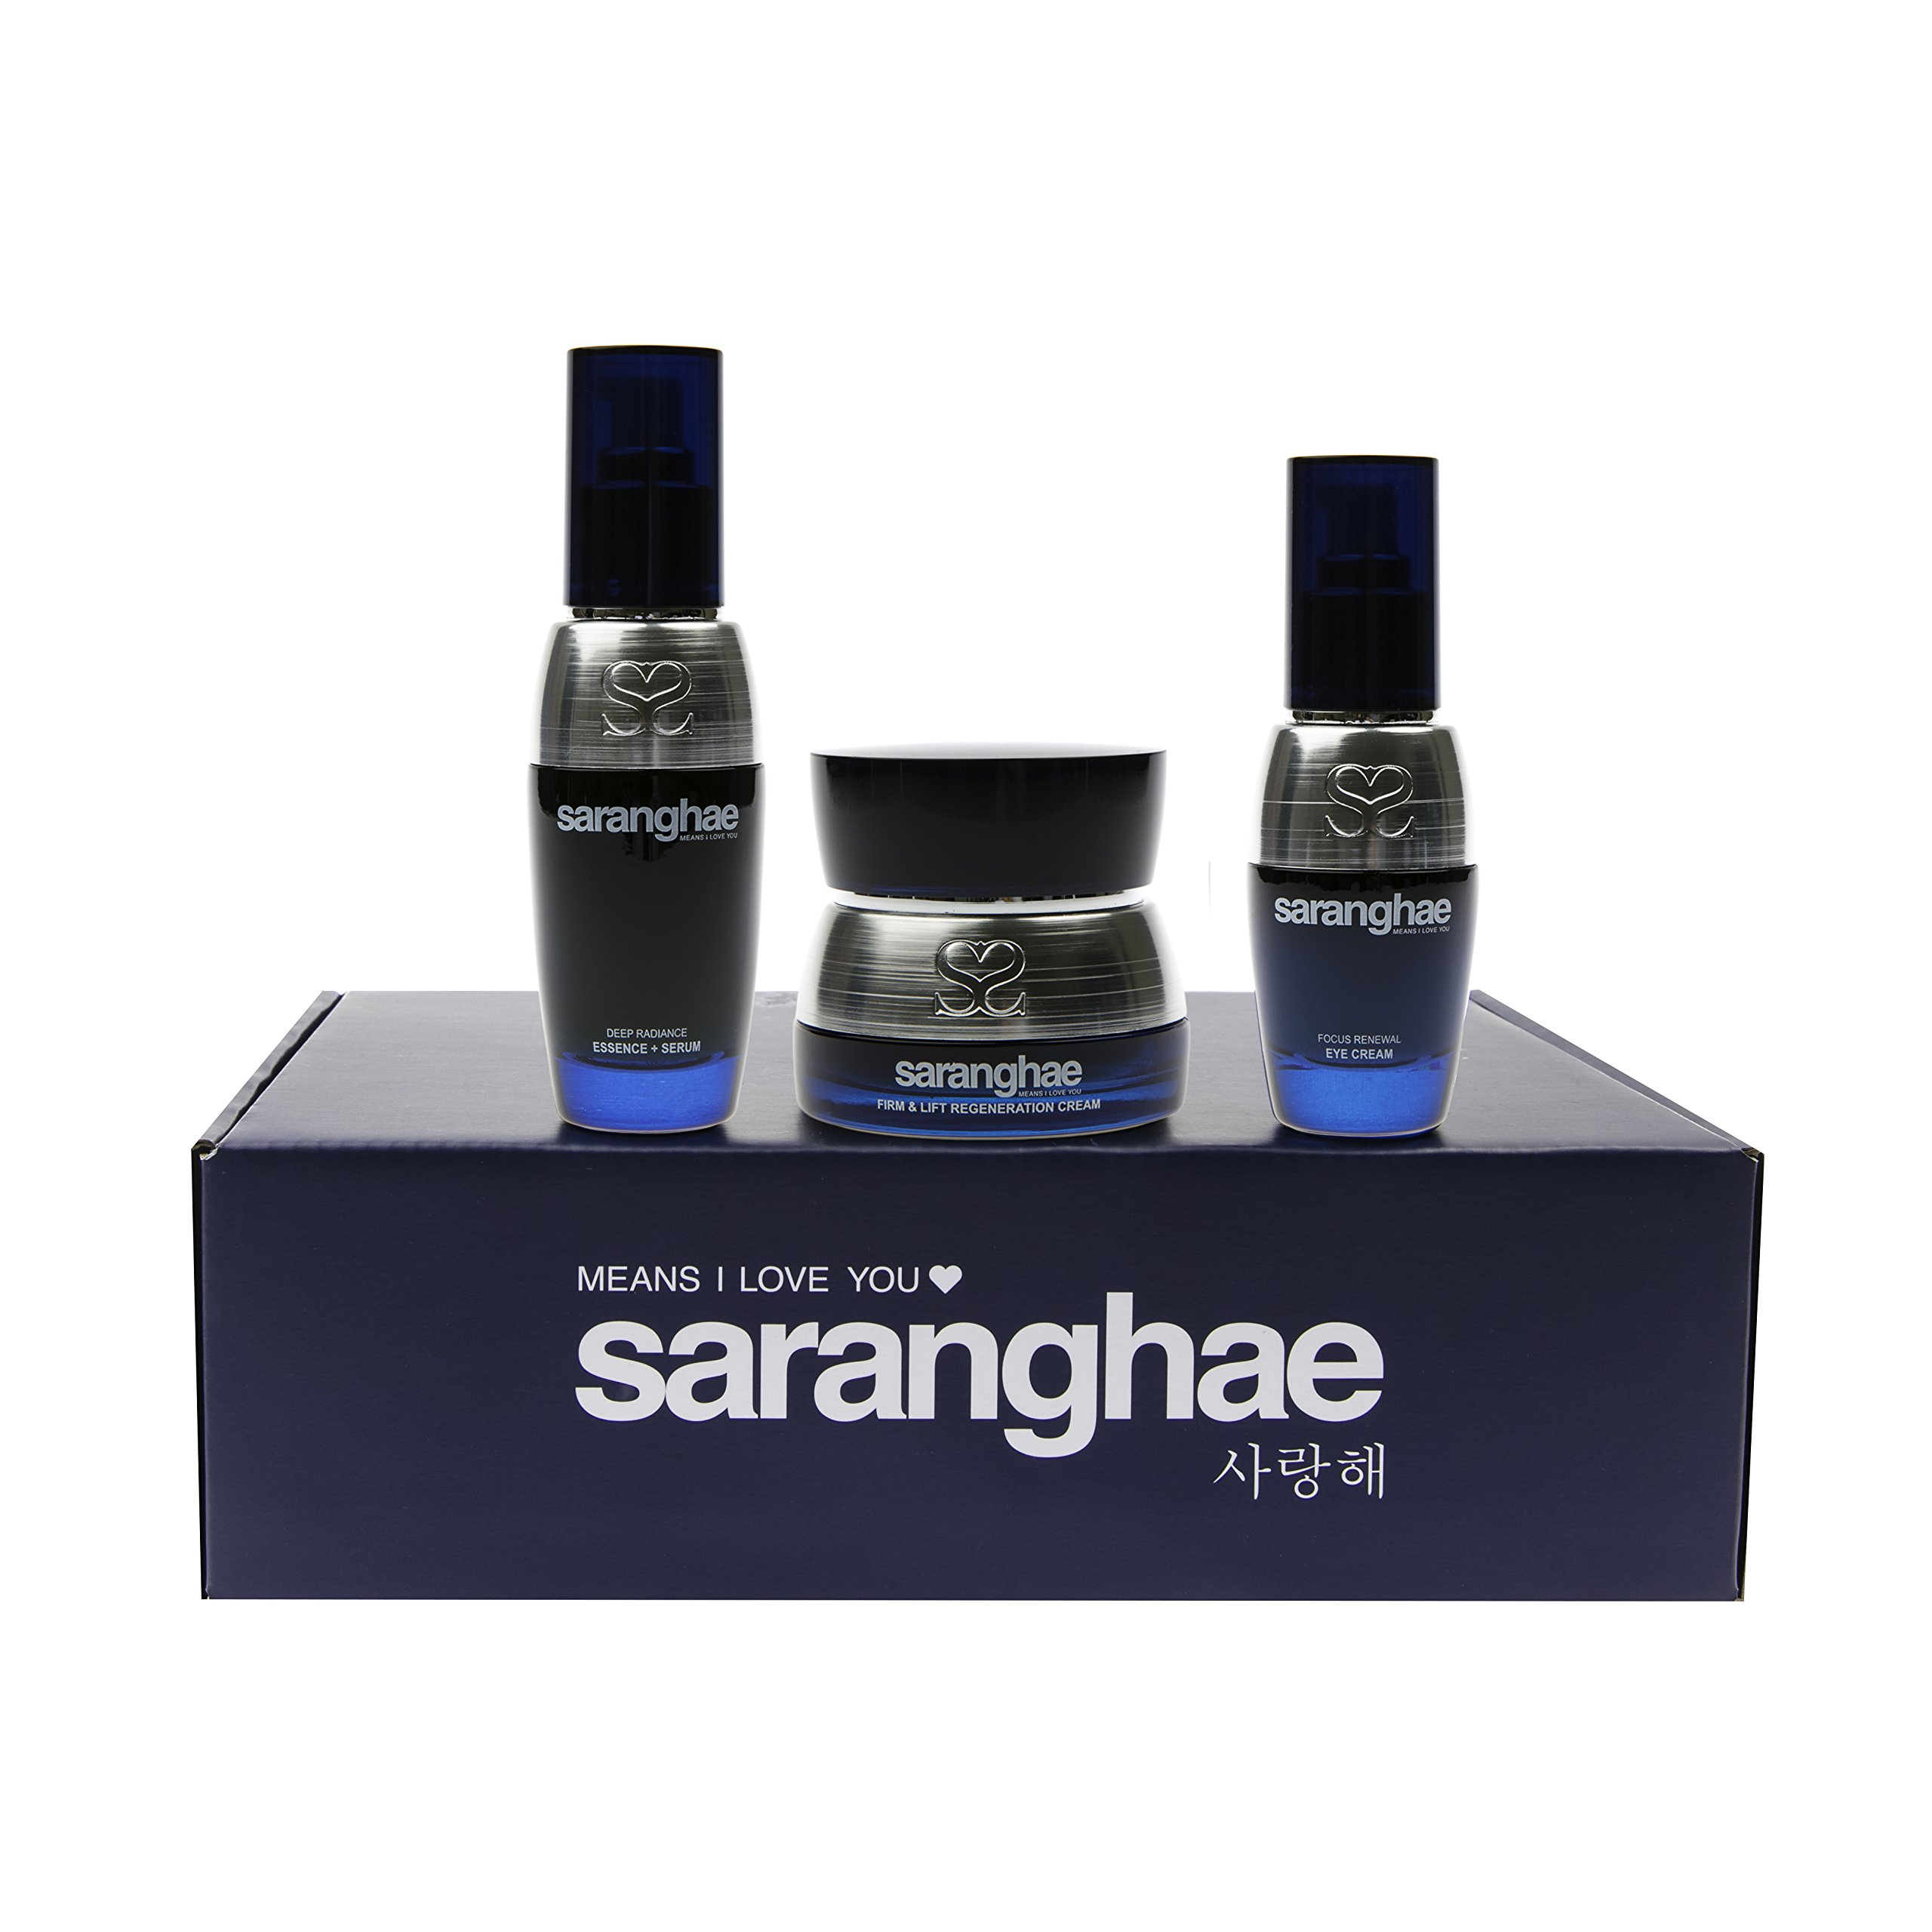 Saranghae Luna Bundle: Deep Radiance Essence + Serum, Firm and Lift Regeneration Cream, Focus Renewal Eye Cream - An Intense Focus On Healing And Repairing